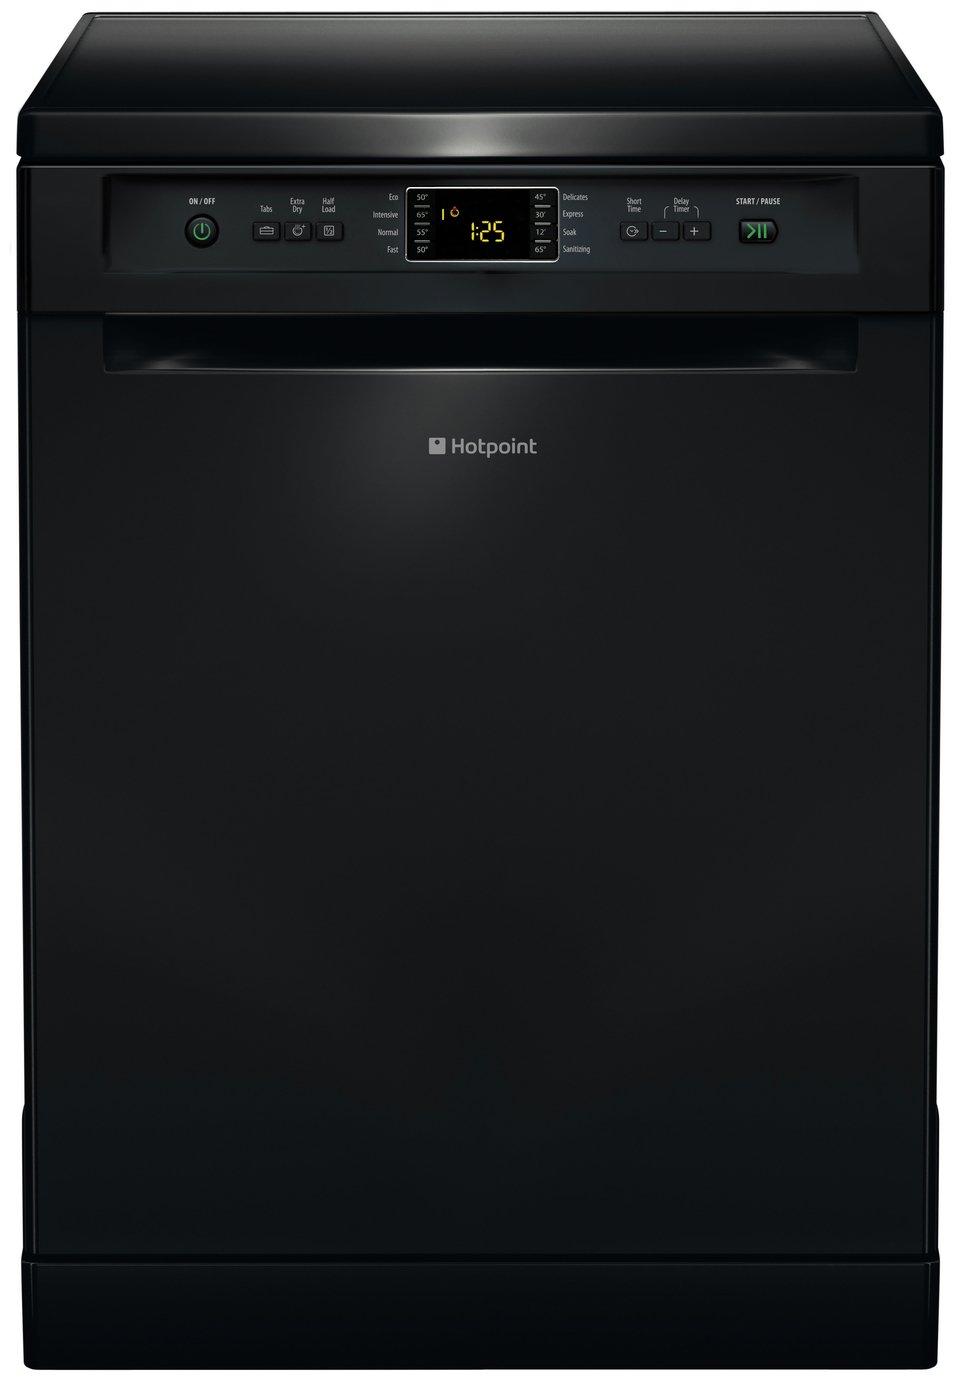 Hotpoint Extra FDFEX11011K Freestanding Dishwasher - Black